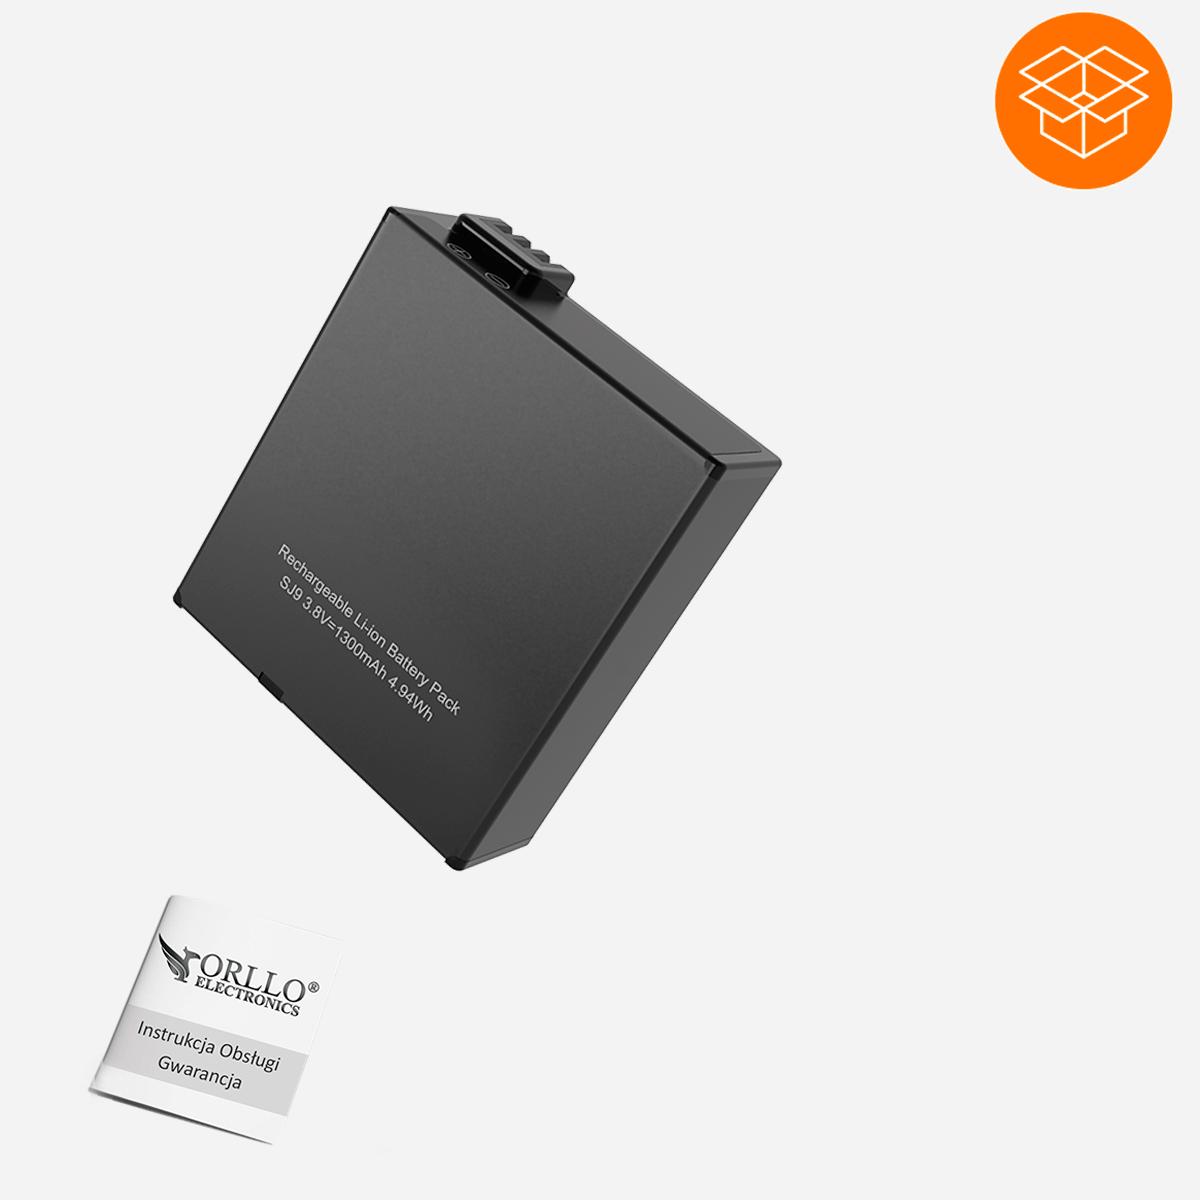 zestaw-bateria-xpro-shark-max-kamera-sportowa-orllo-pl